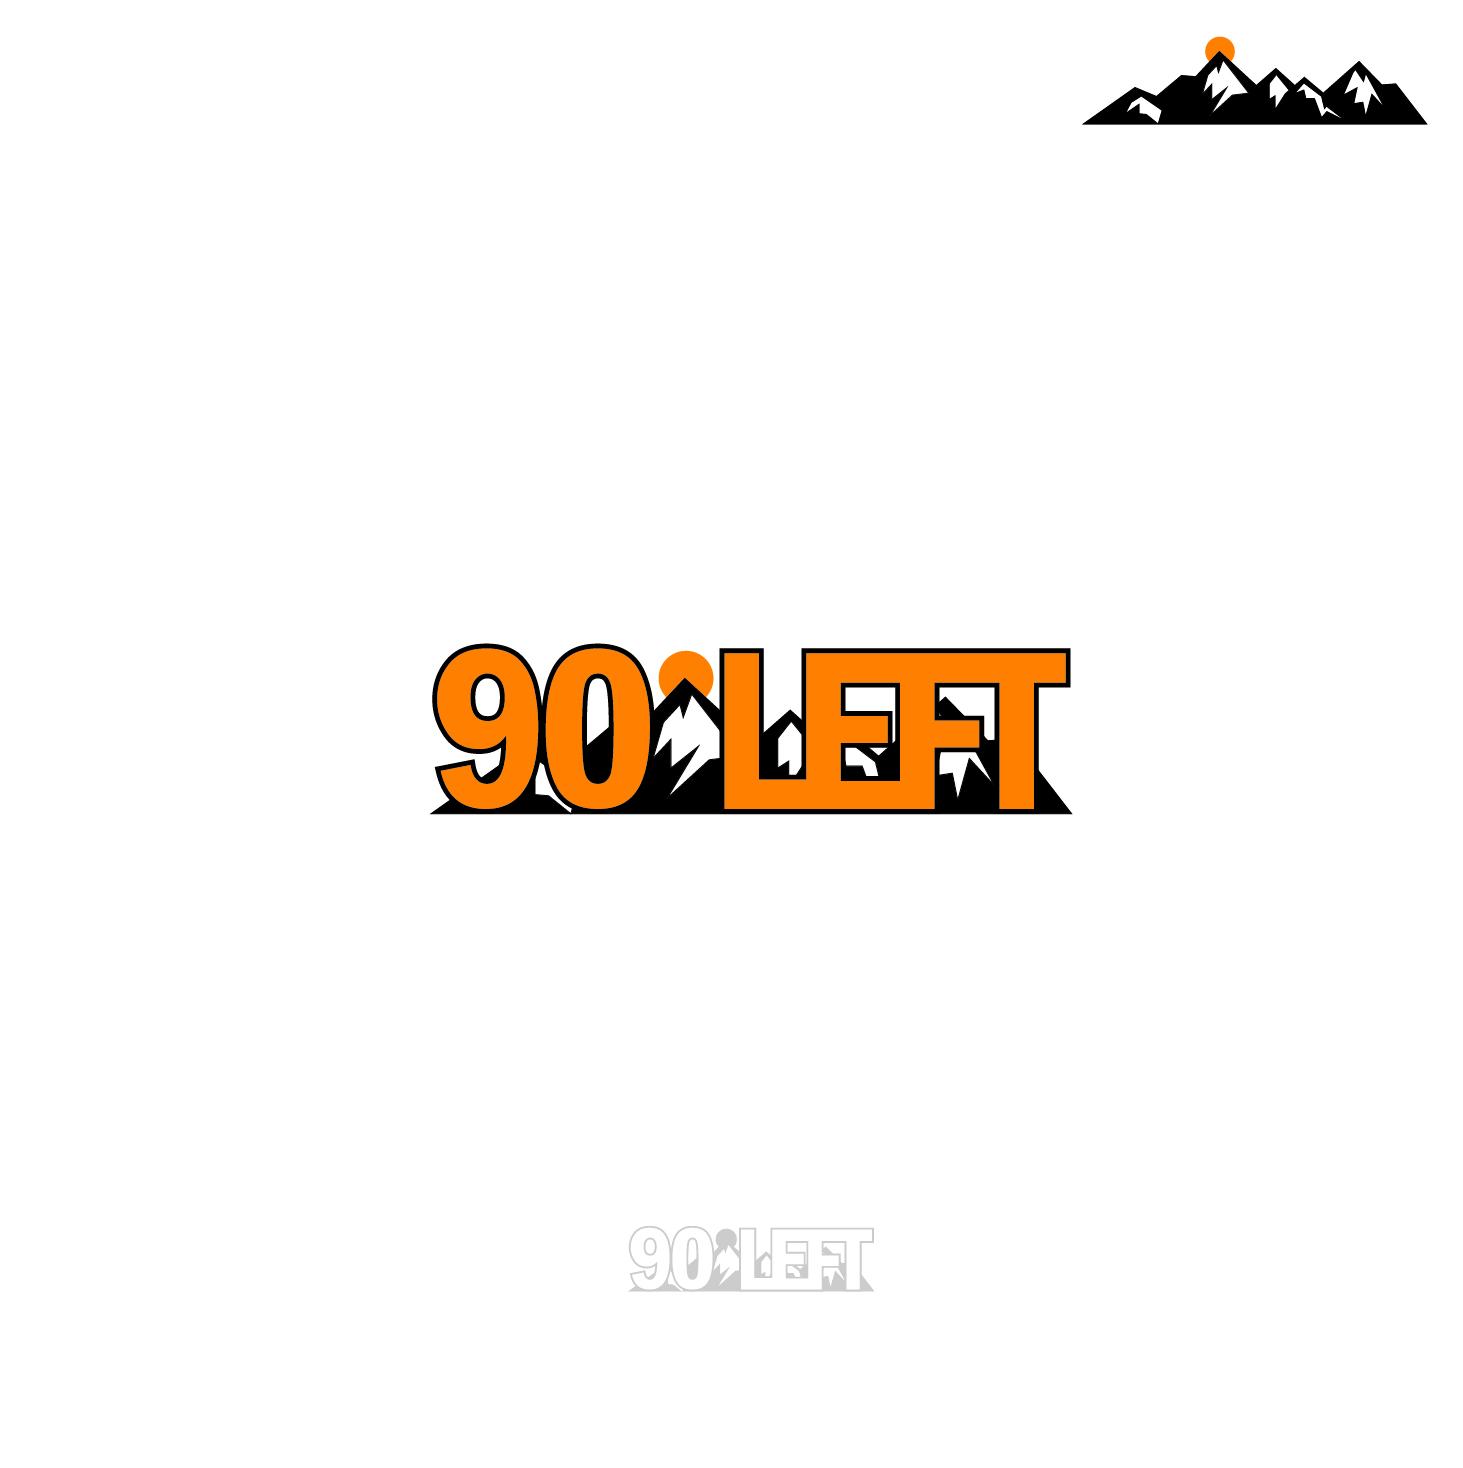 Modern Elegant It Company Logo Design For 90degree Symbolleft By